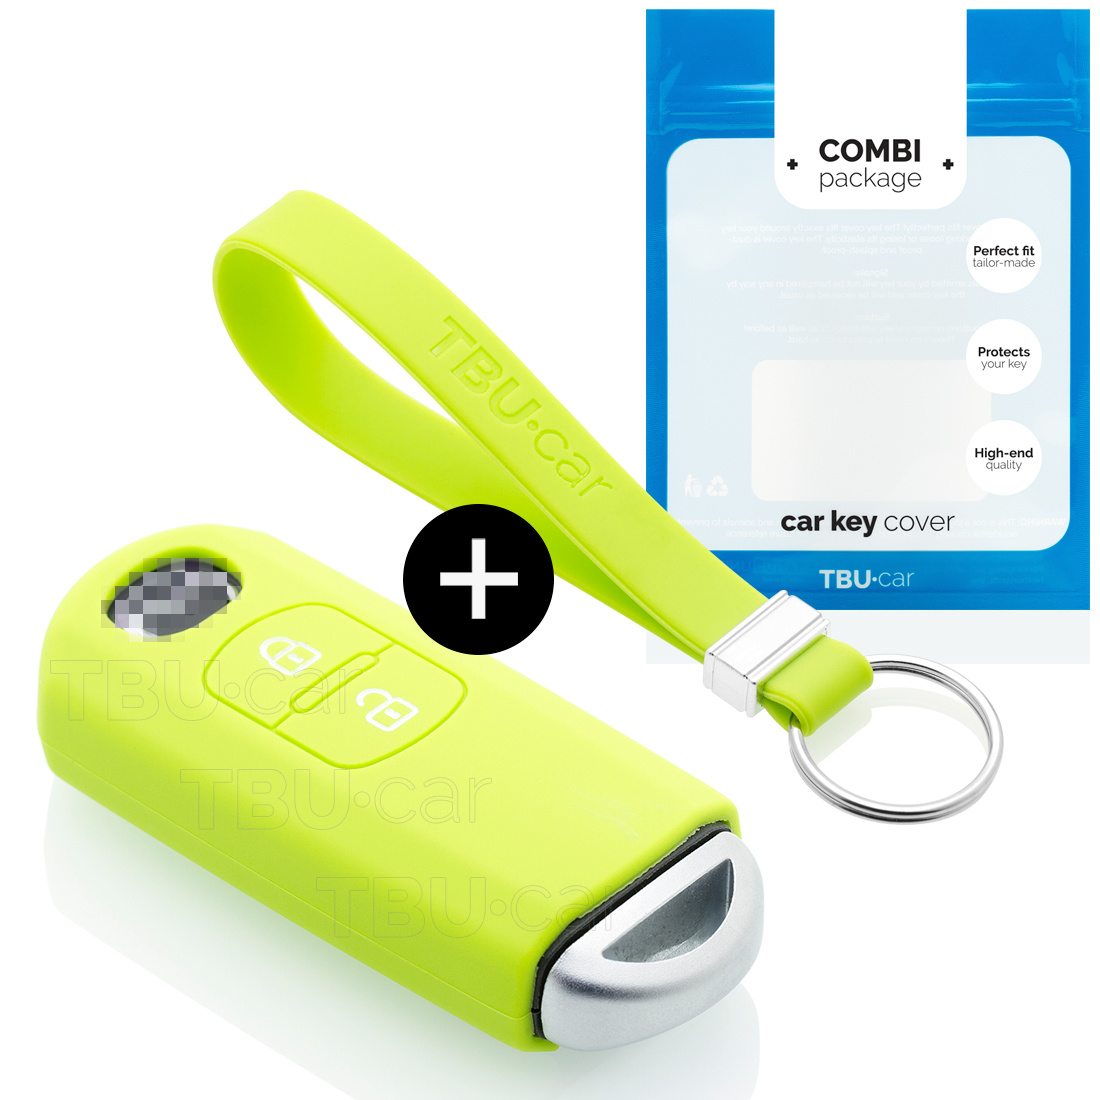 TBU car TBU car Sleutel cover compatibel met Mazda - Silicone sleutelhoesje - beschermhoesje autosleutel - Lime groen